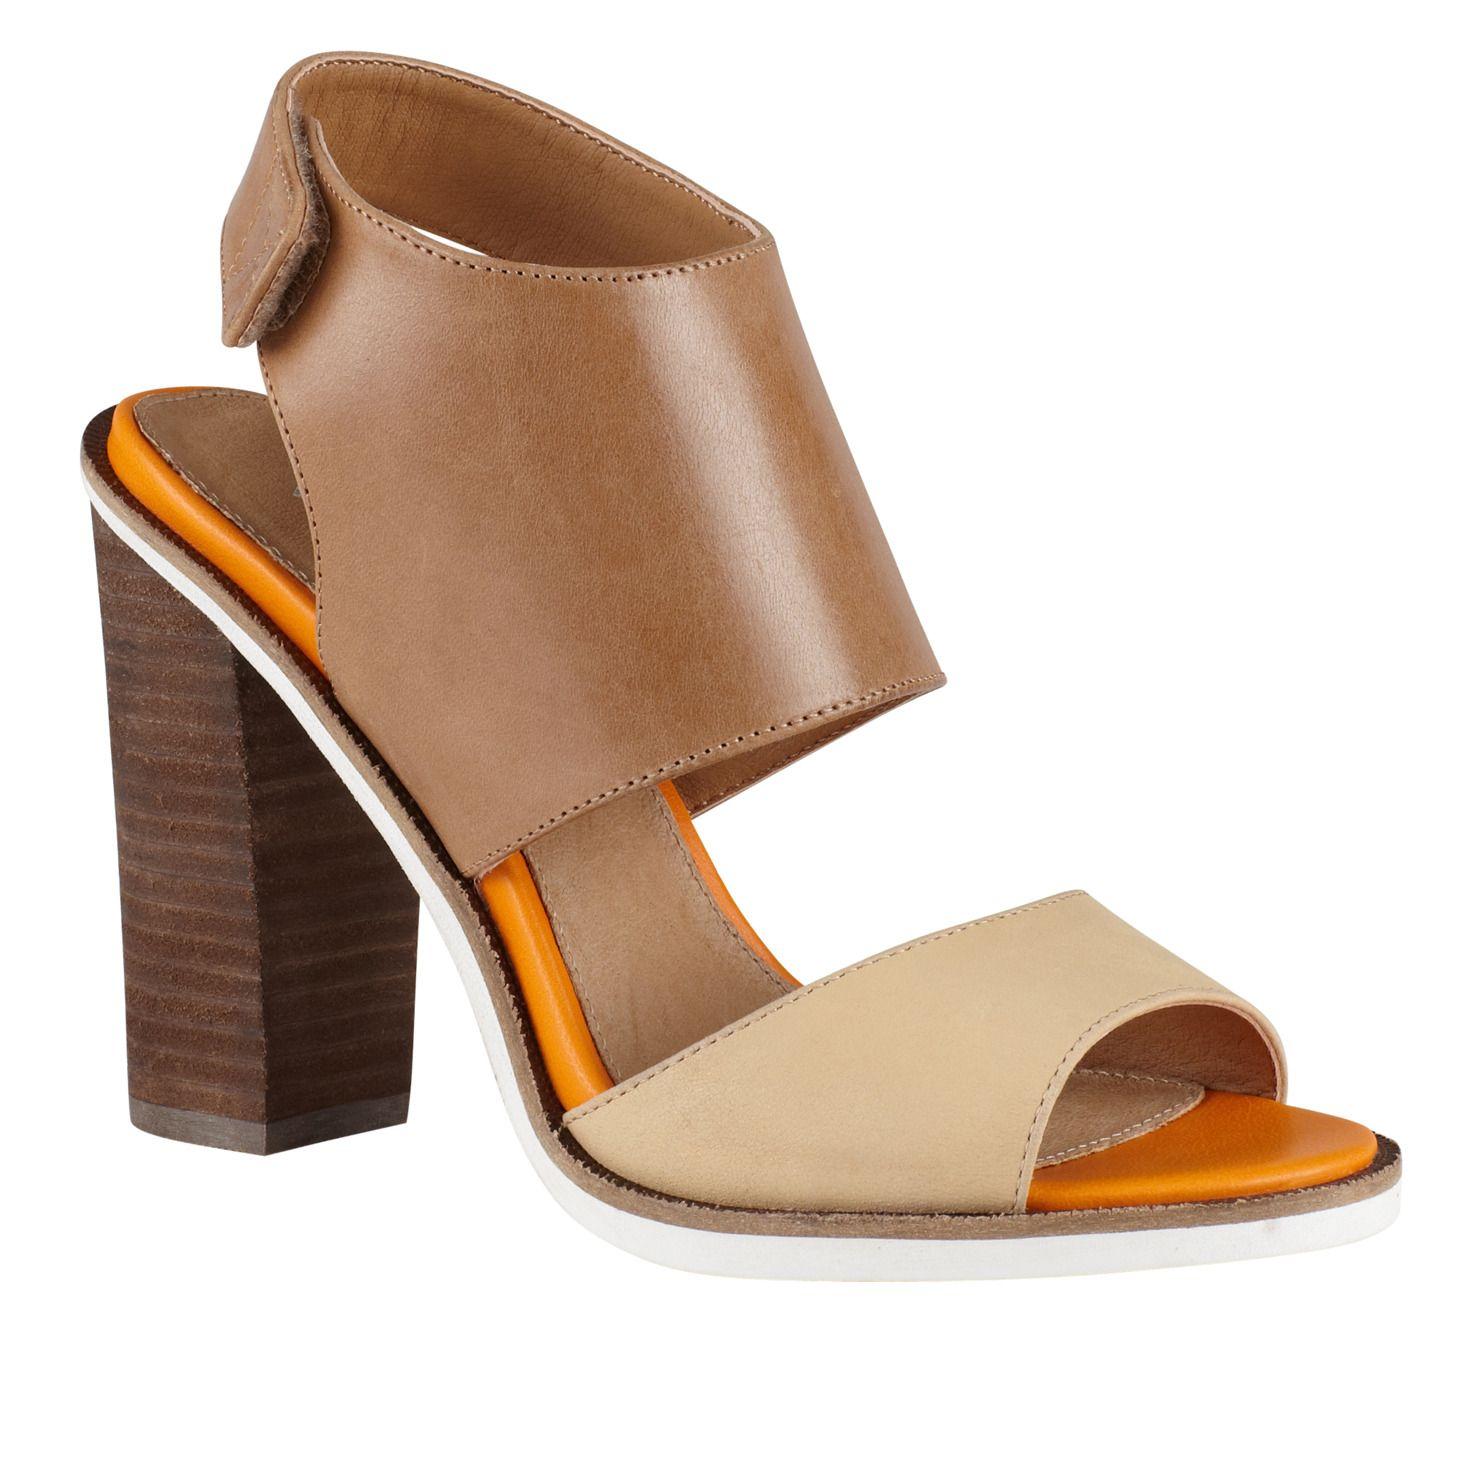 d91ba416c2dc ELING - women s high heels sandals for sale at ALDO Shoes.